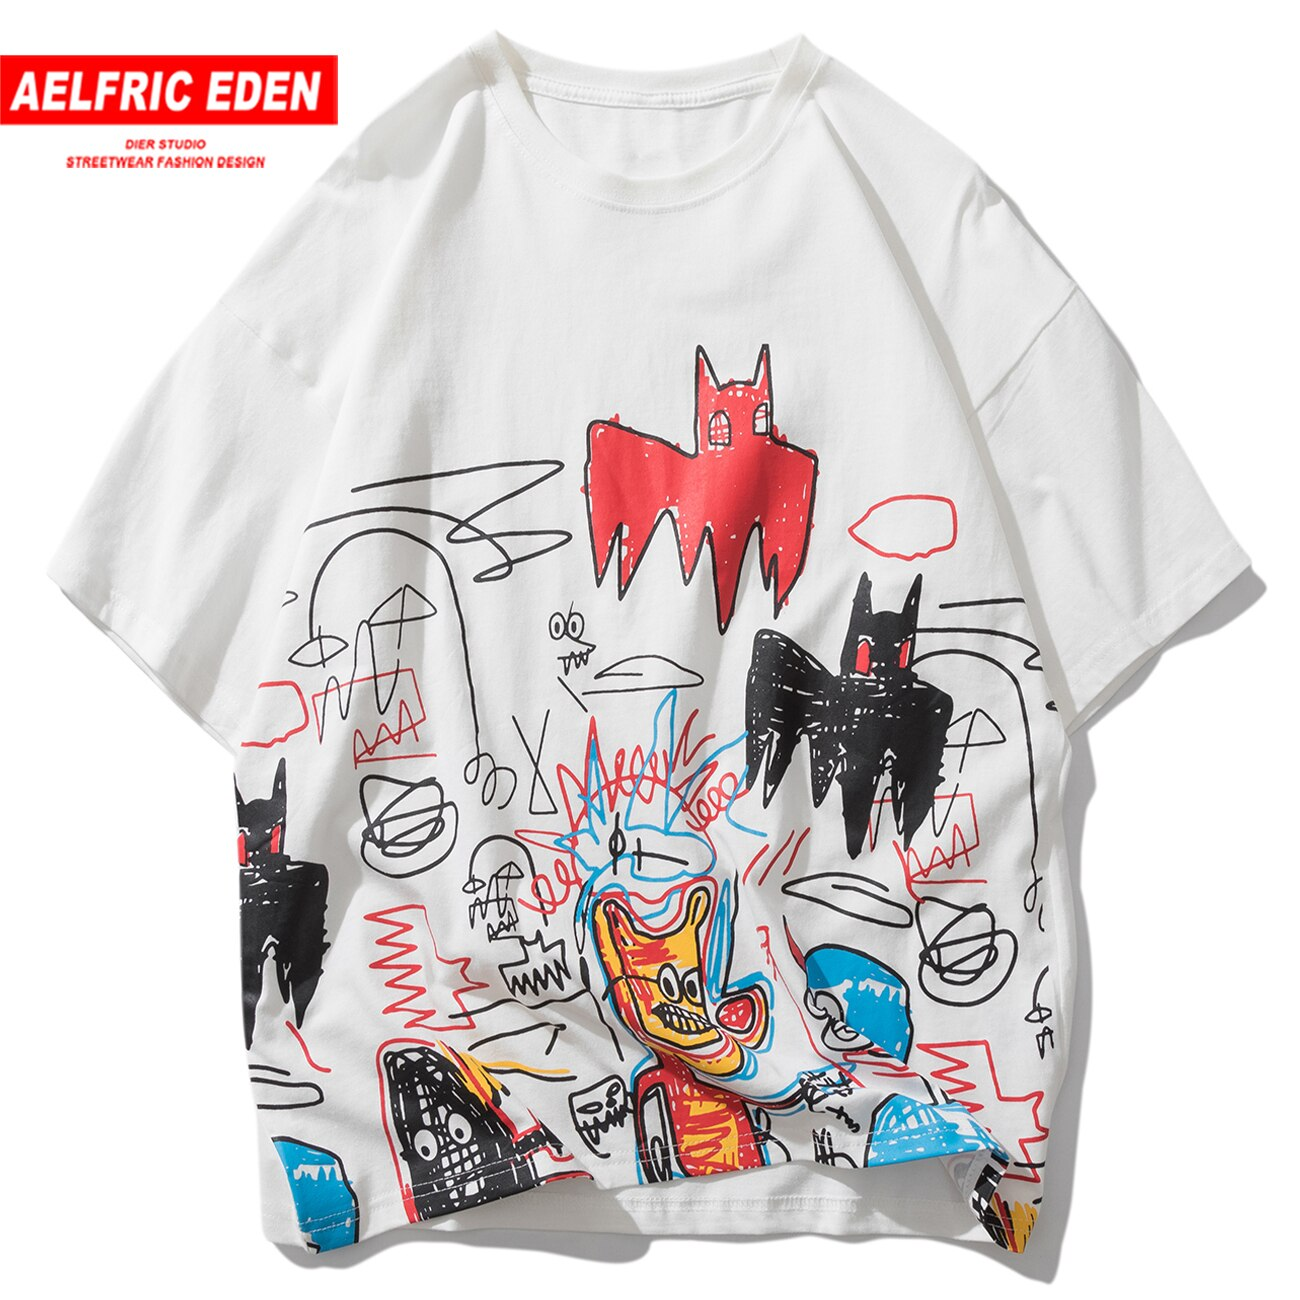 Aelfric Eden dibujo grafiti dibujo camiseta de Hip-Hop Oversize hombres 2020 verano Harajuku algodón manga corta Camisetas Streetwear